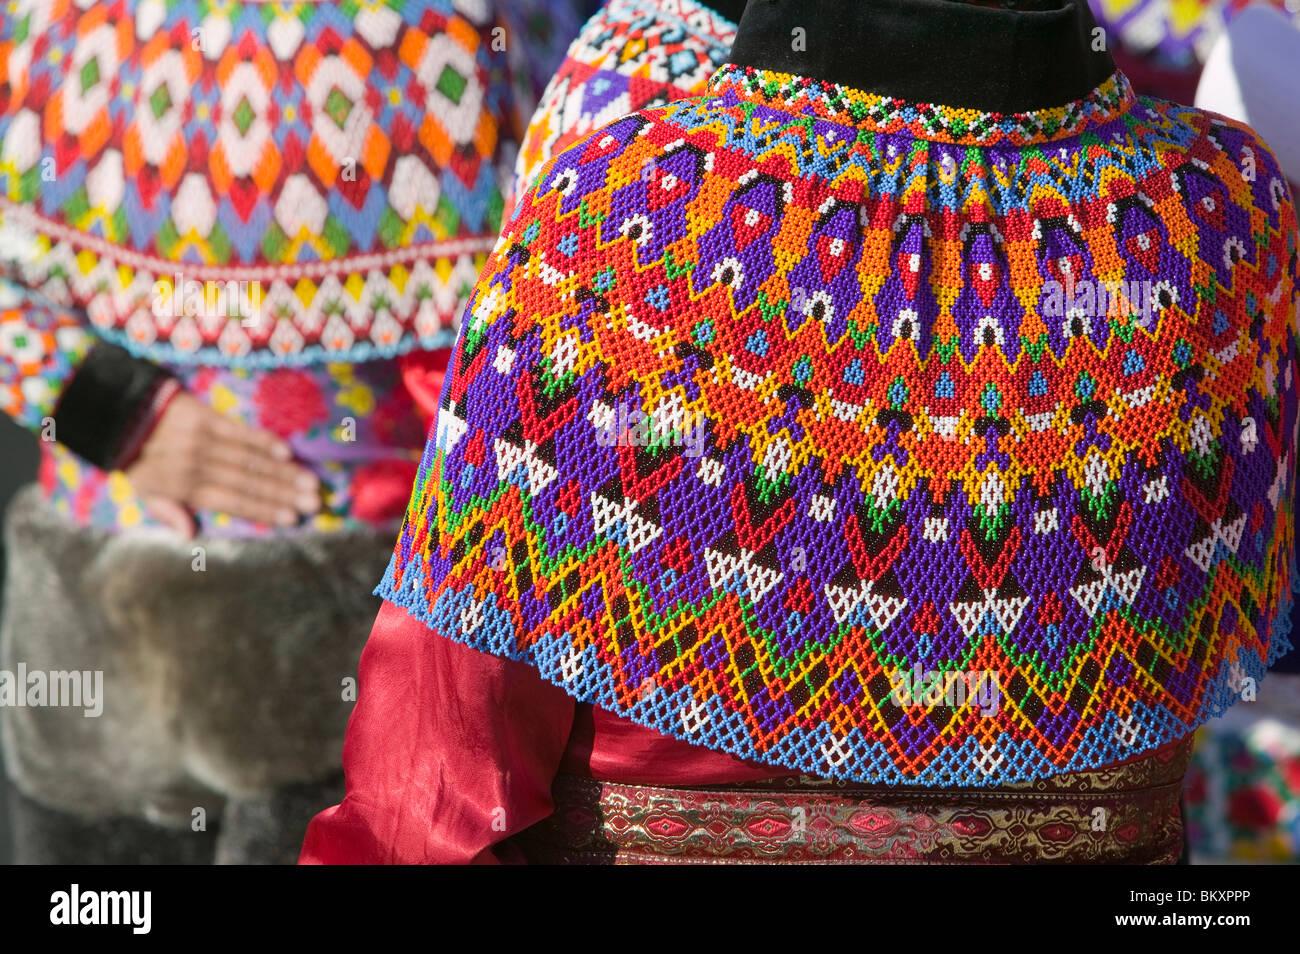 Inuit women wearing traditional Greenlandic national costume or Kalaallisuut in Ilulissat on Greenland. - Stock Image